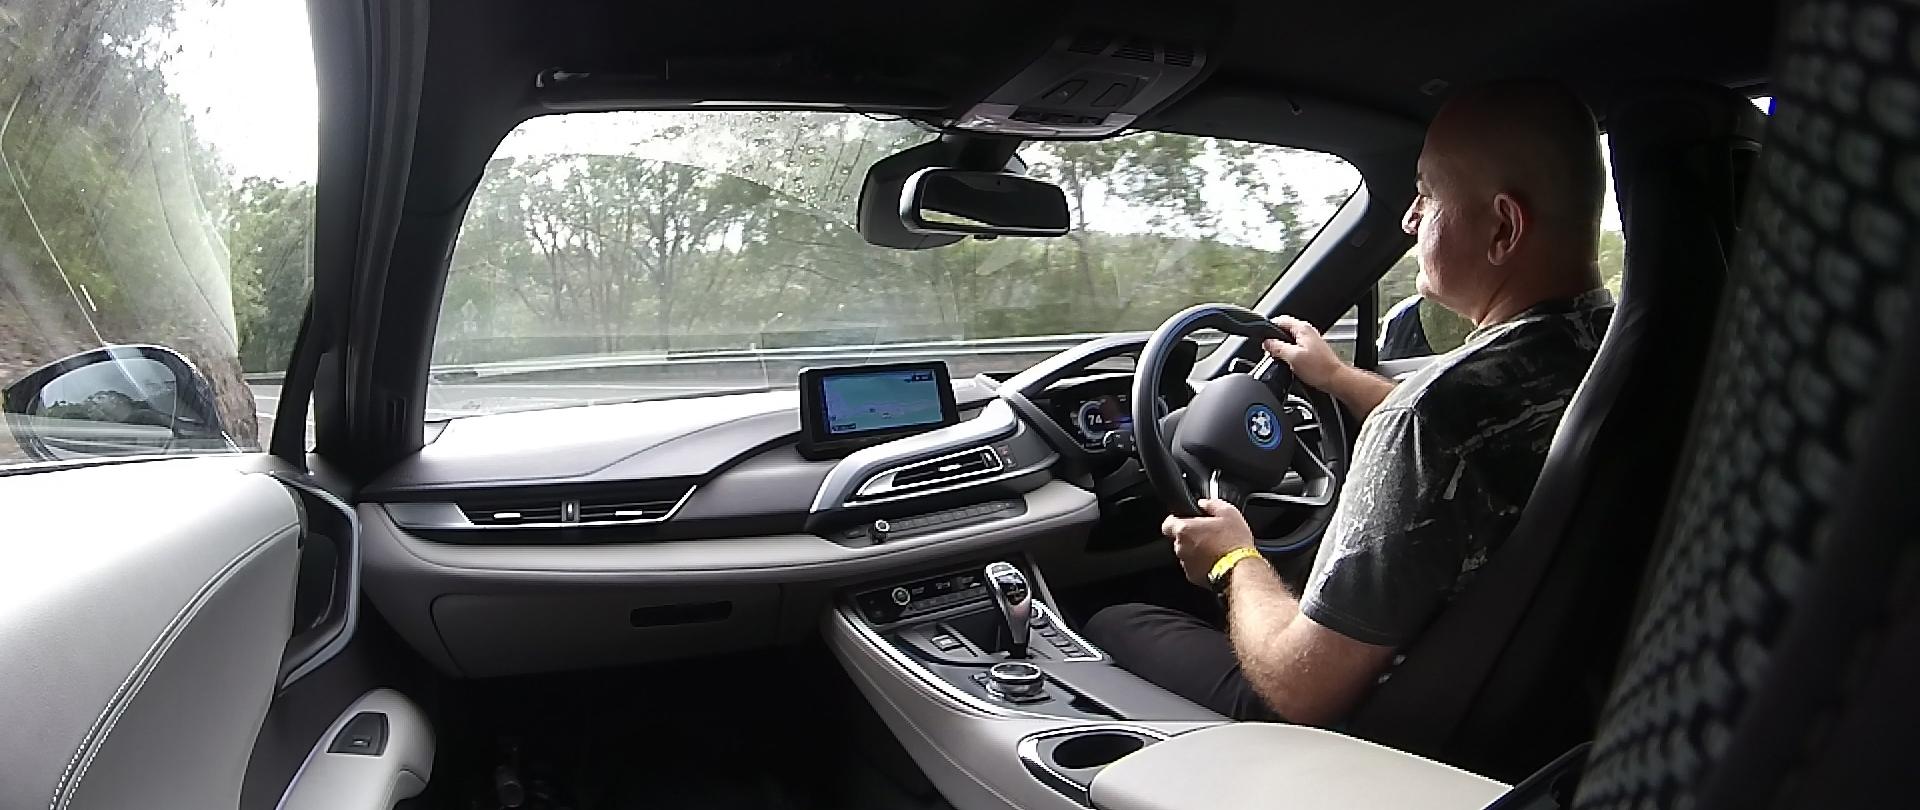 BMW i8 08.jpg